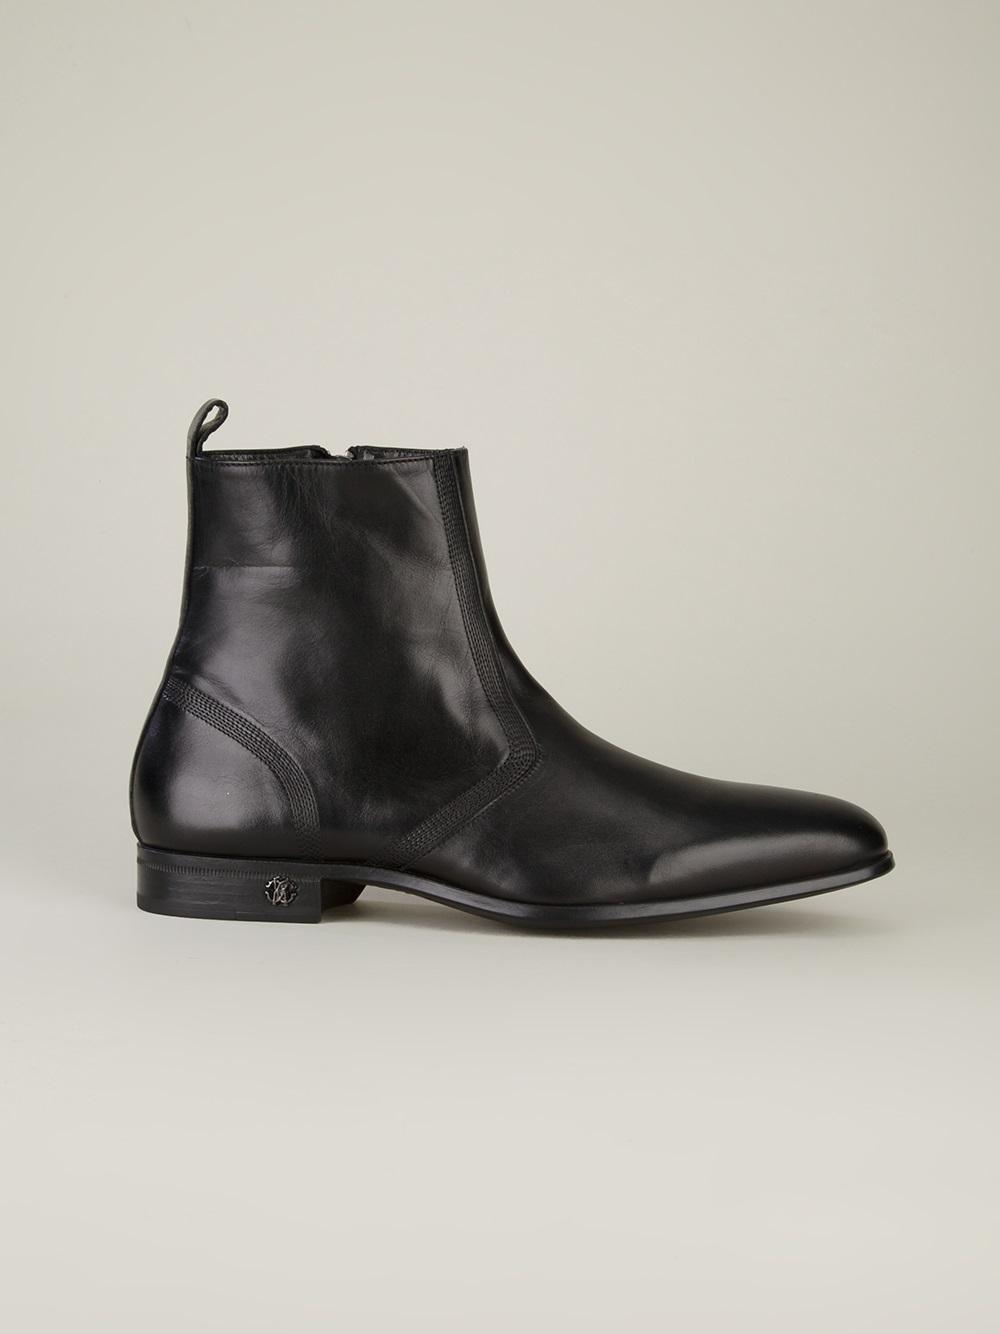 Roberto CavalliZipped ankle boots PRwdBZngPa